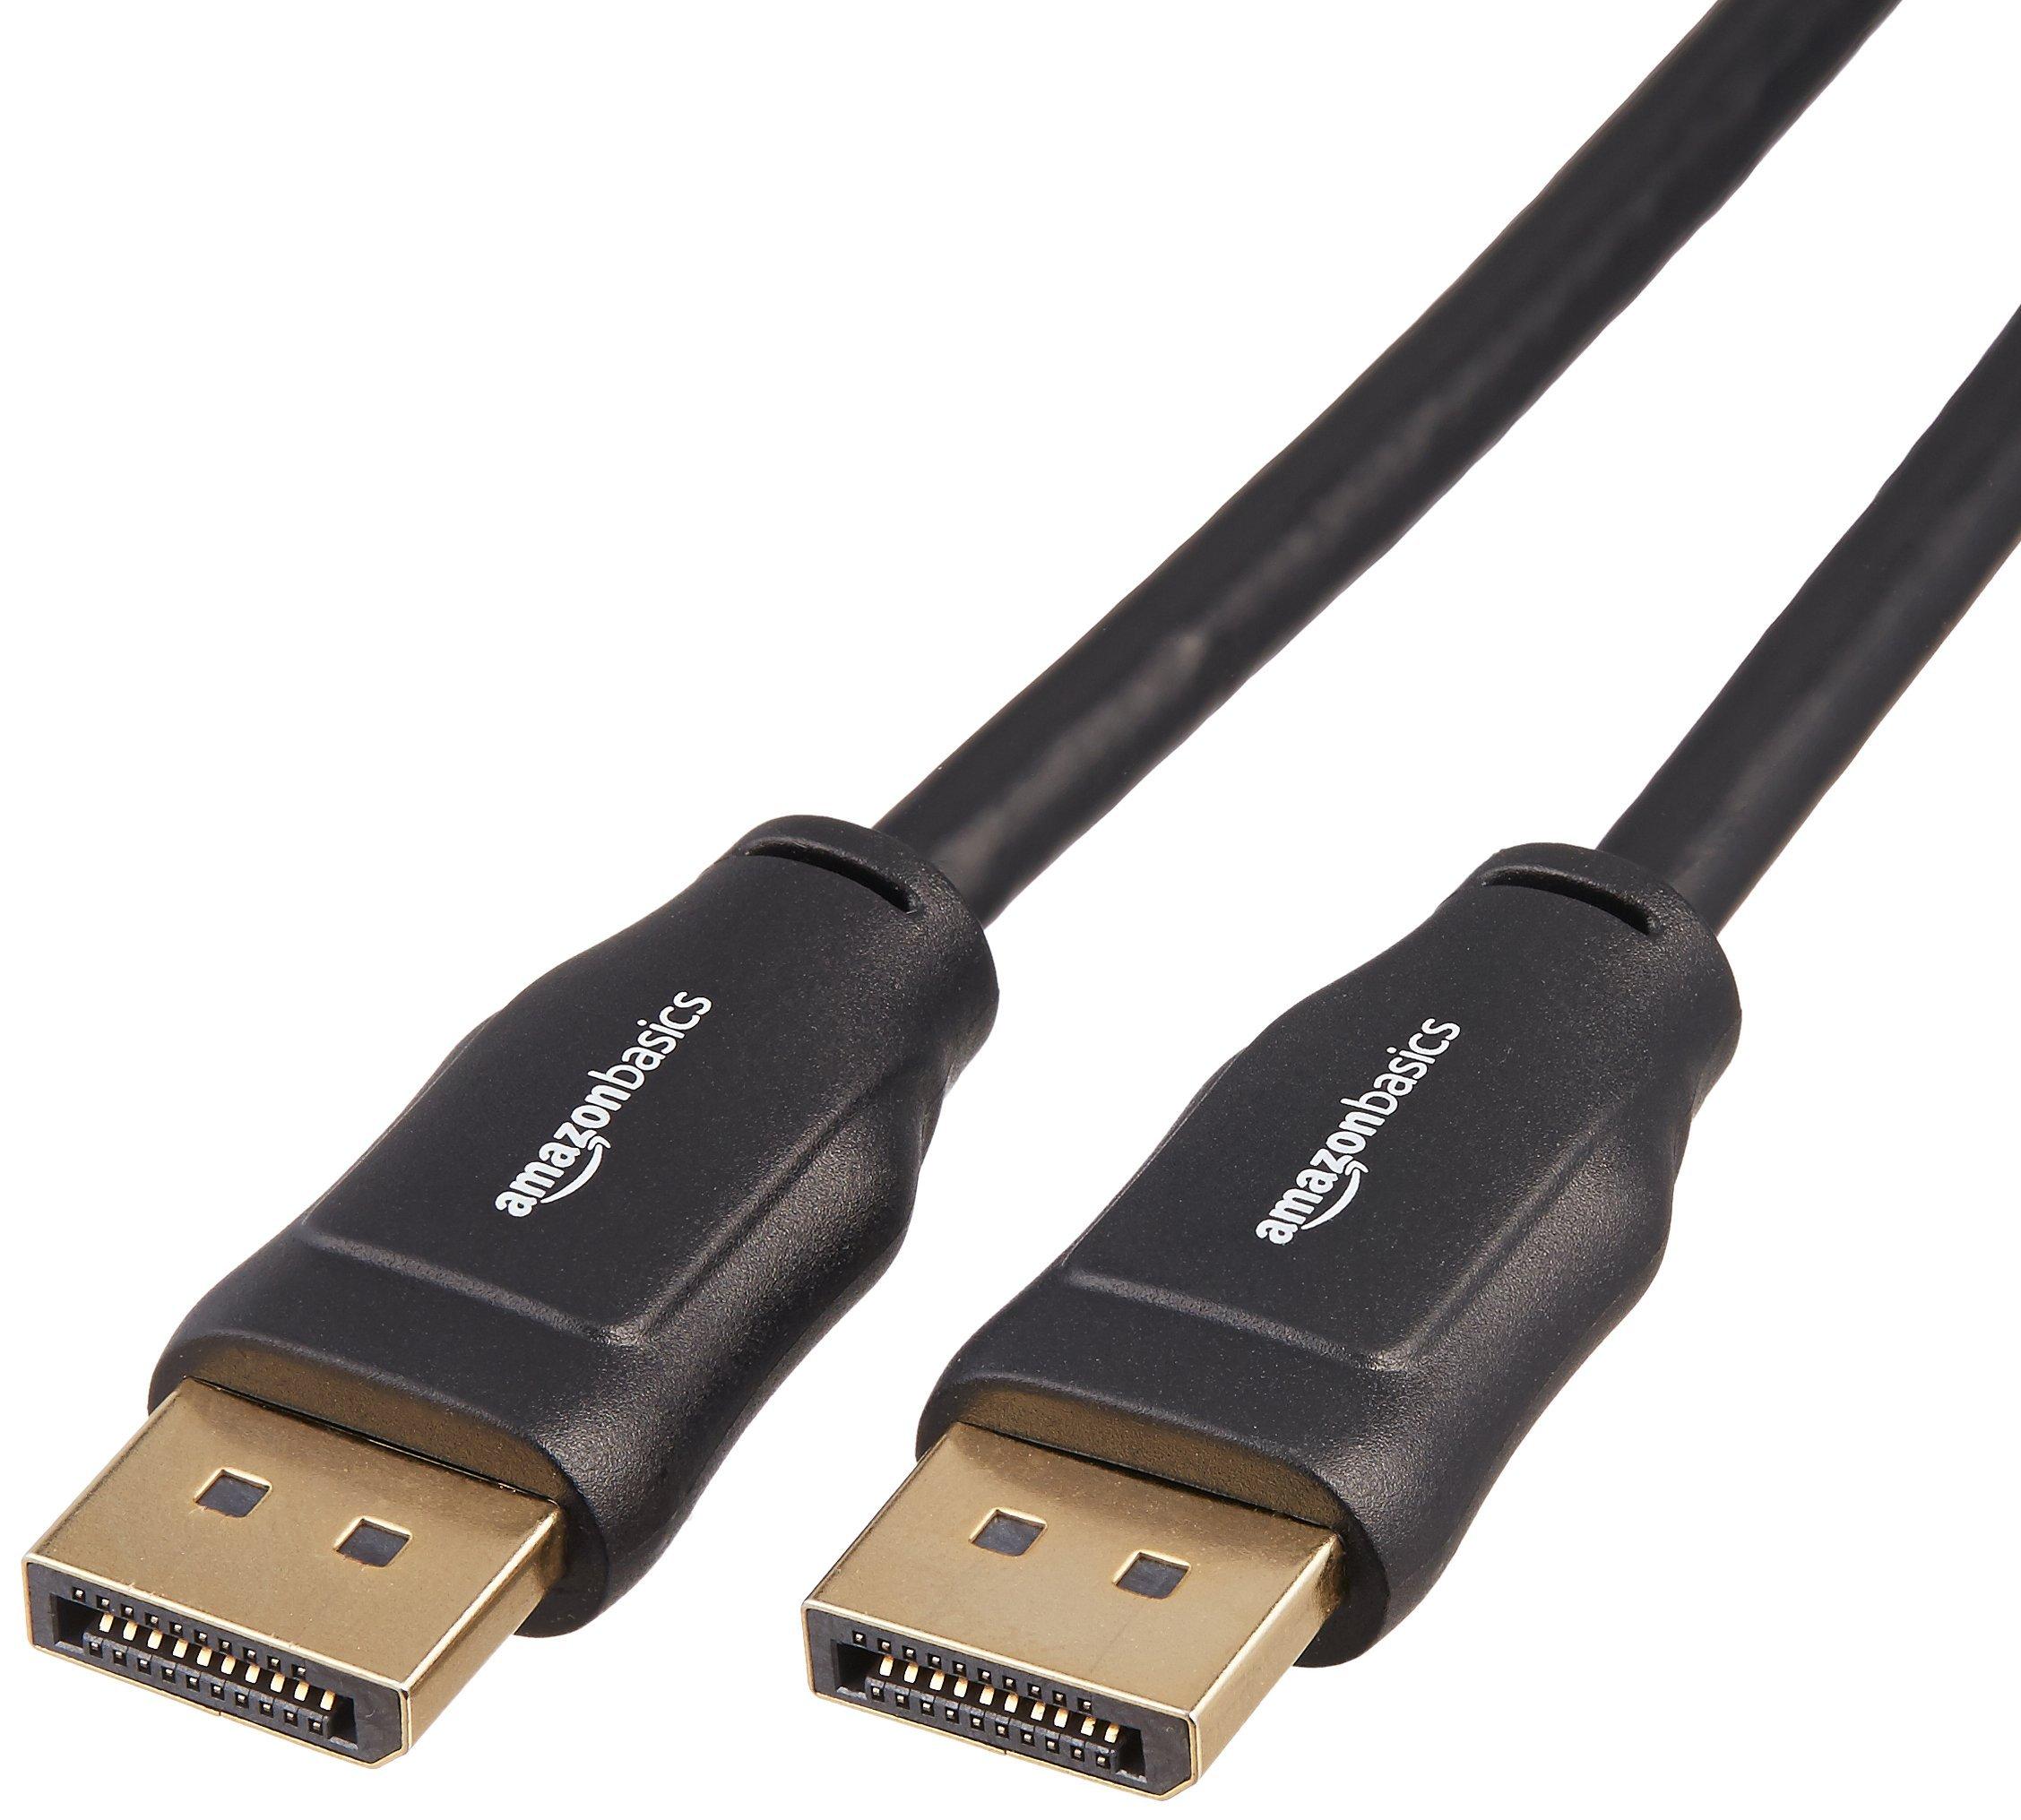 AmazonBasics DisplayPort to DisplayPort Cable - 6 Feet